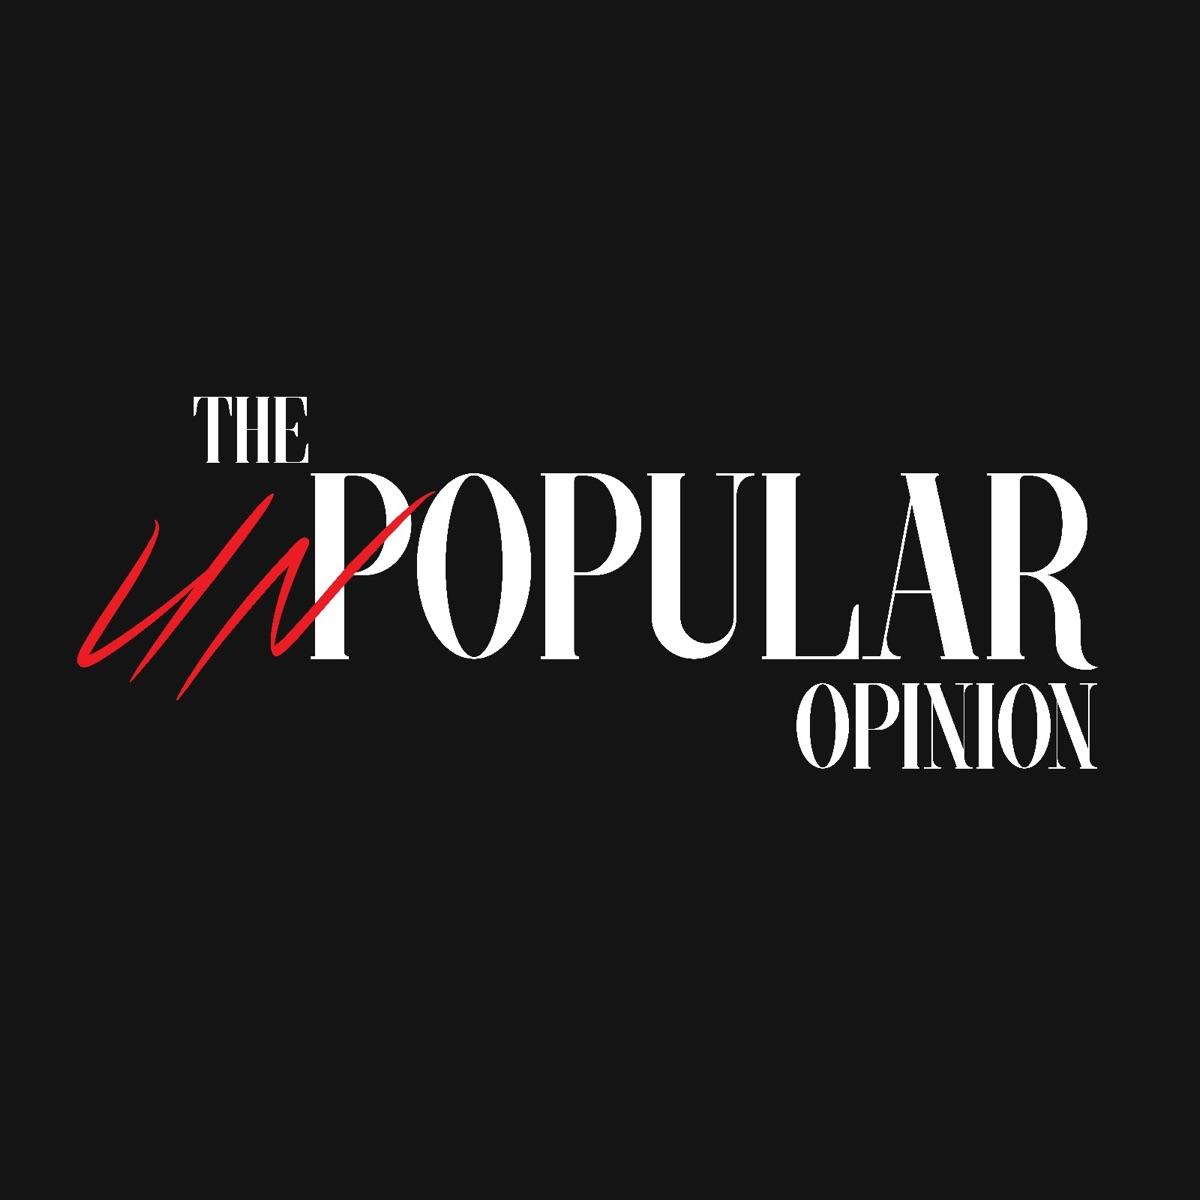 The Unpopular Opinion